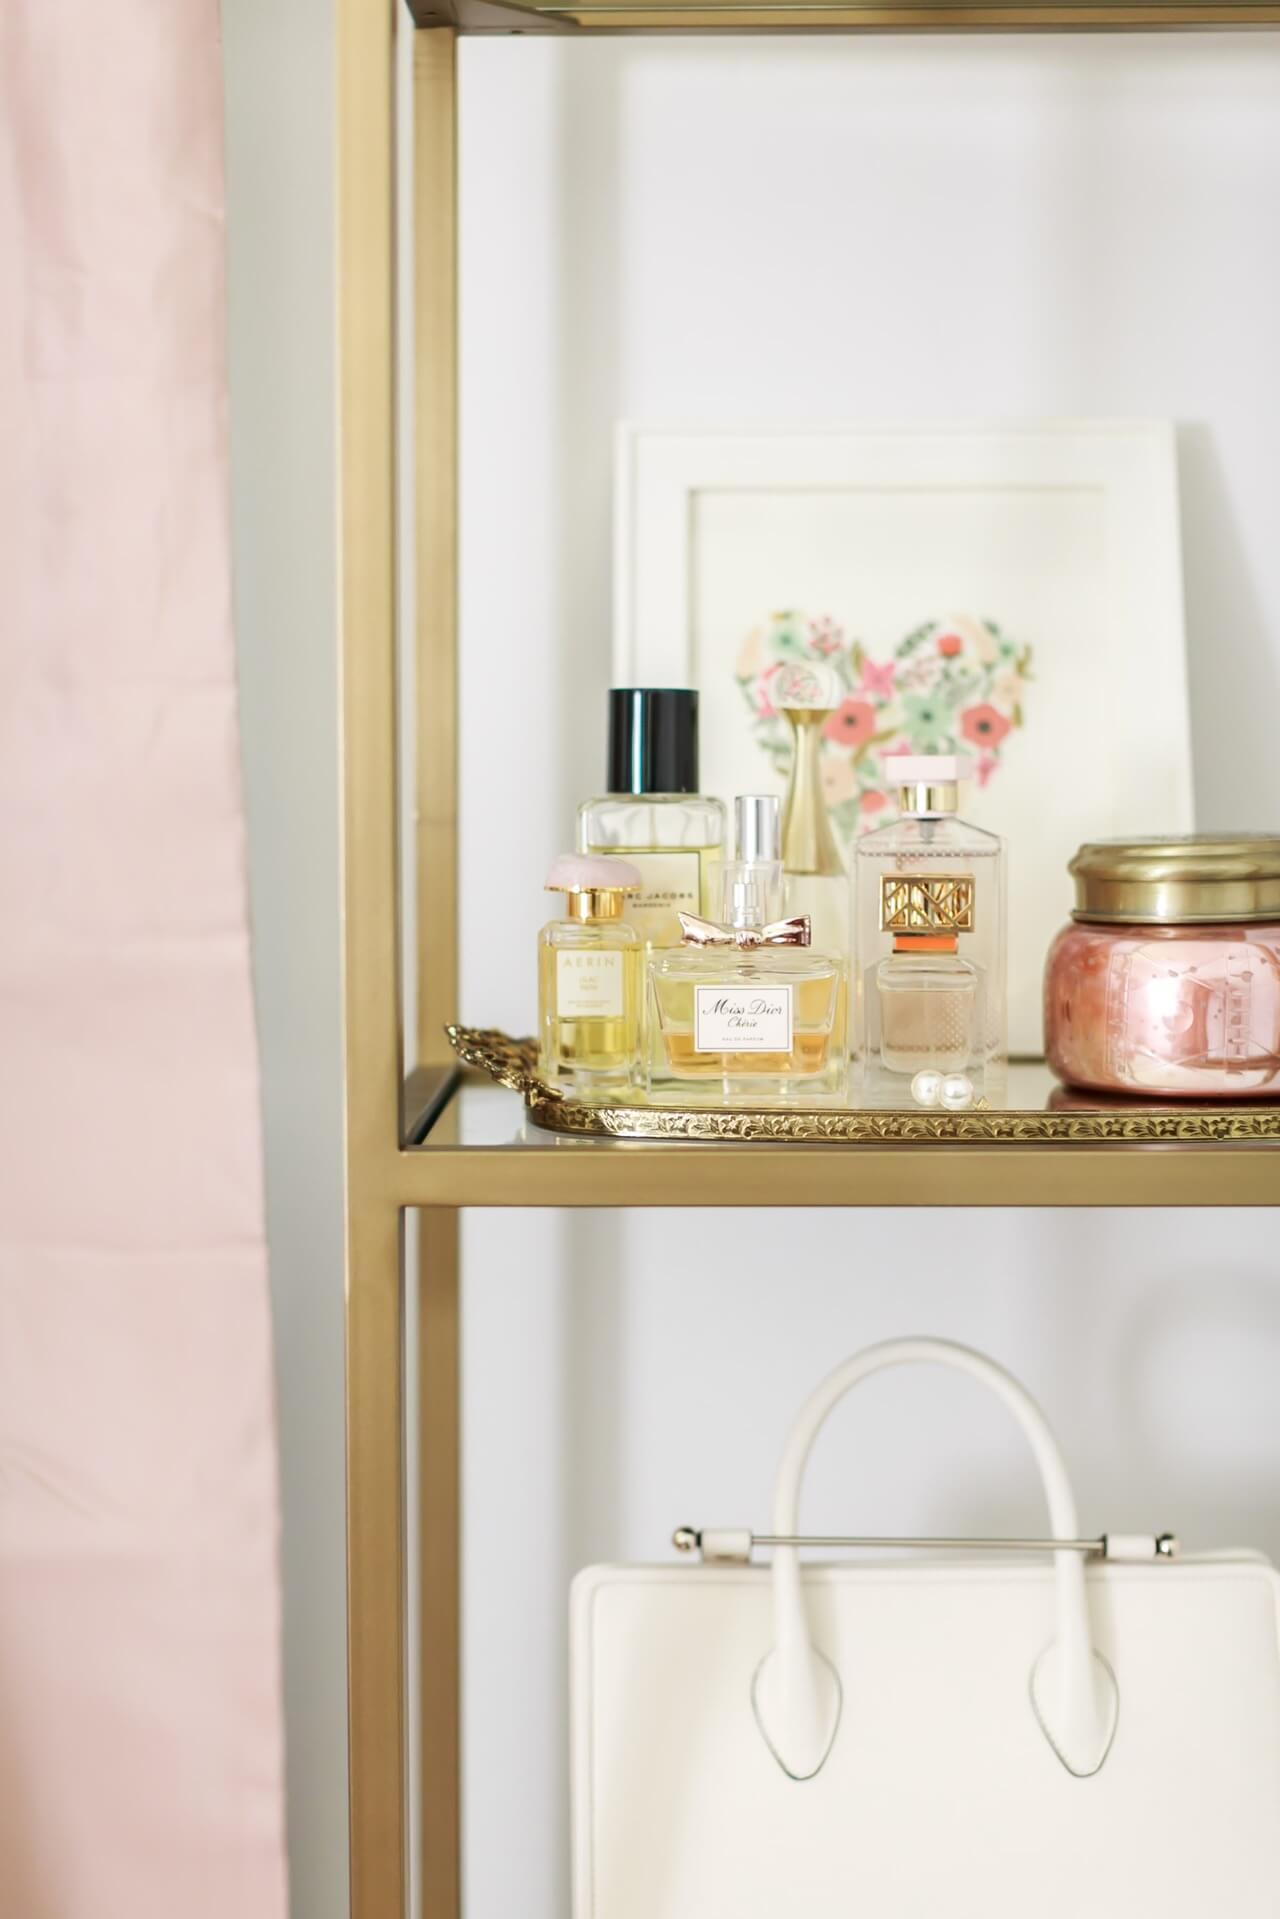 tray of perfume on bookshelf